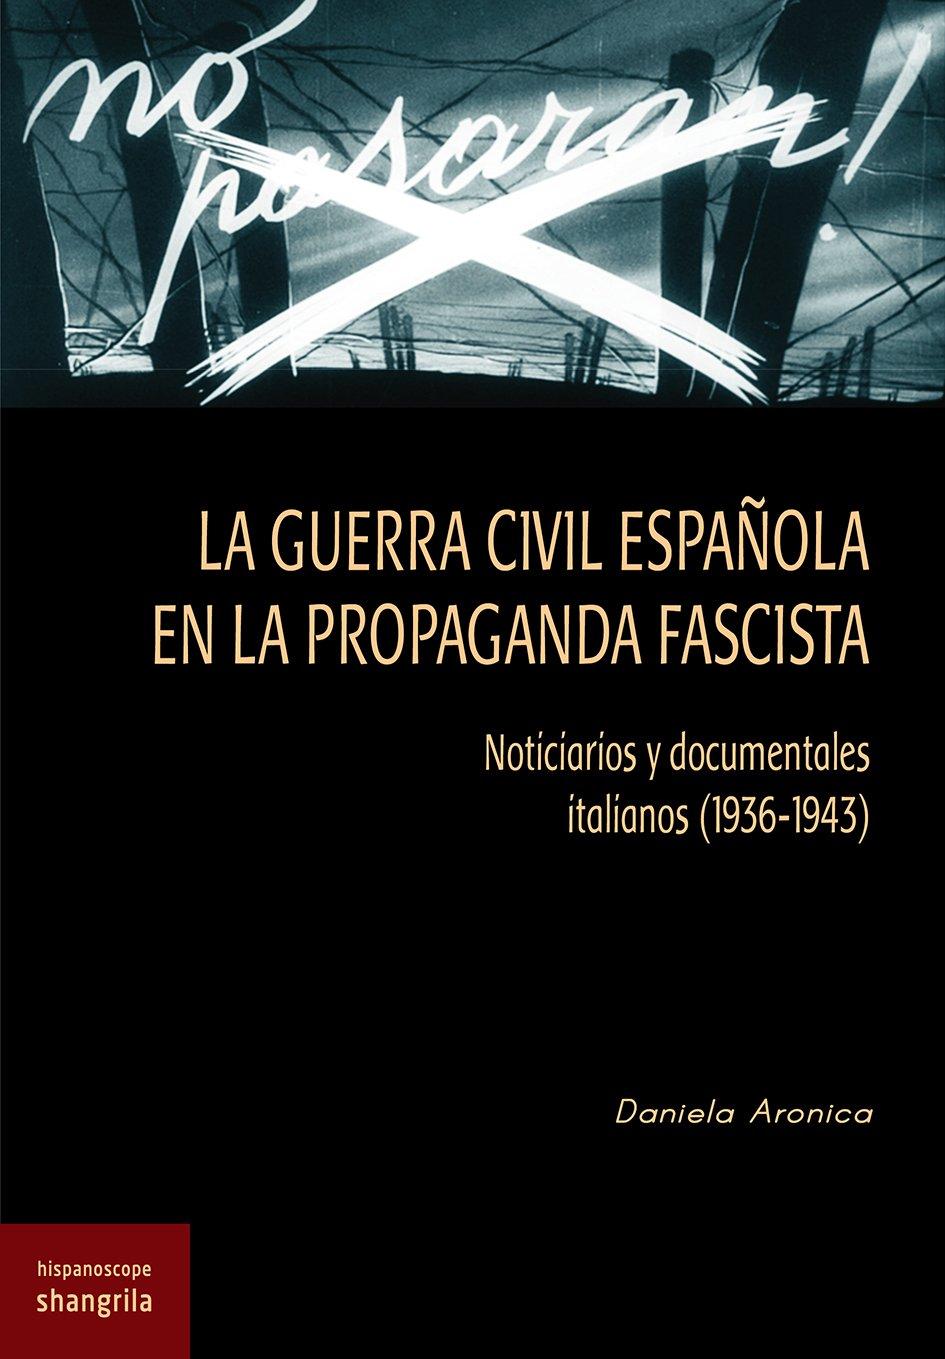 La Guerra Civil Española en la propaganda fascista – Shangrila